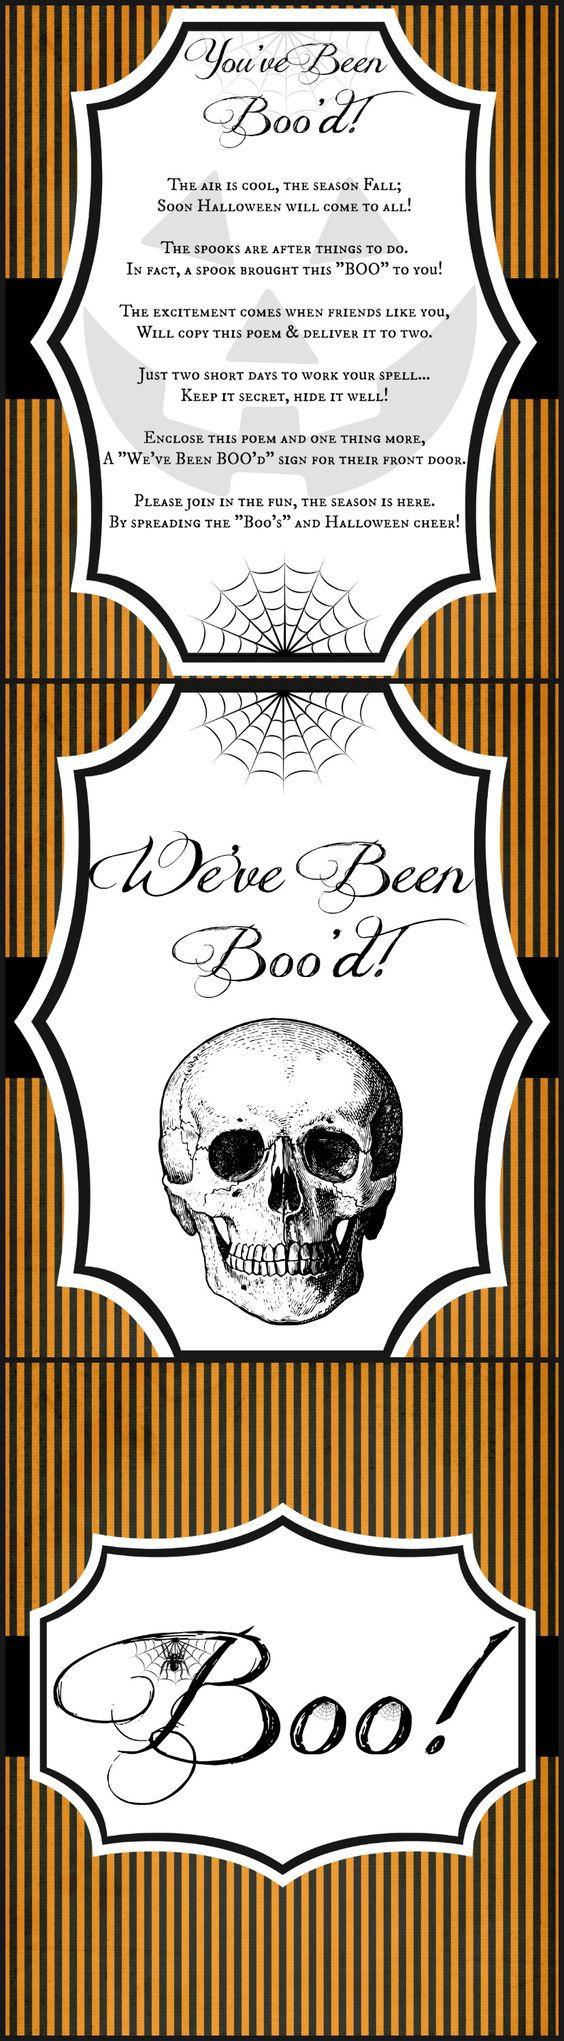 Free Halloween BOO basket printables #halloween #boo #halloweenboo #printable #free #halloweenprintable #holiday #diy #halloweencrafts